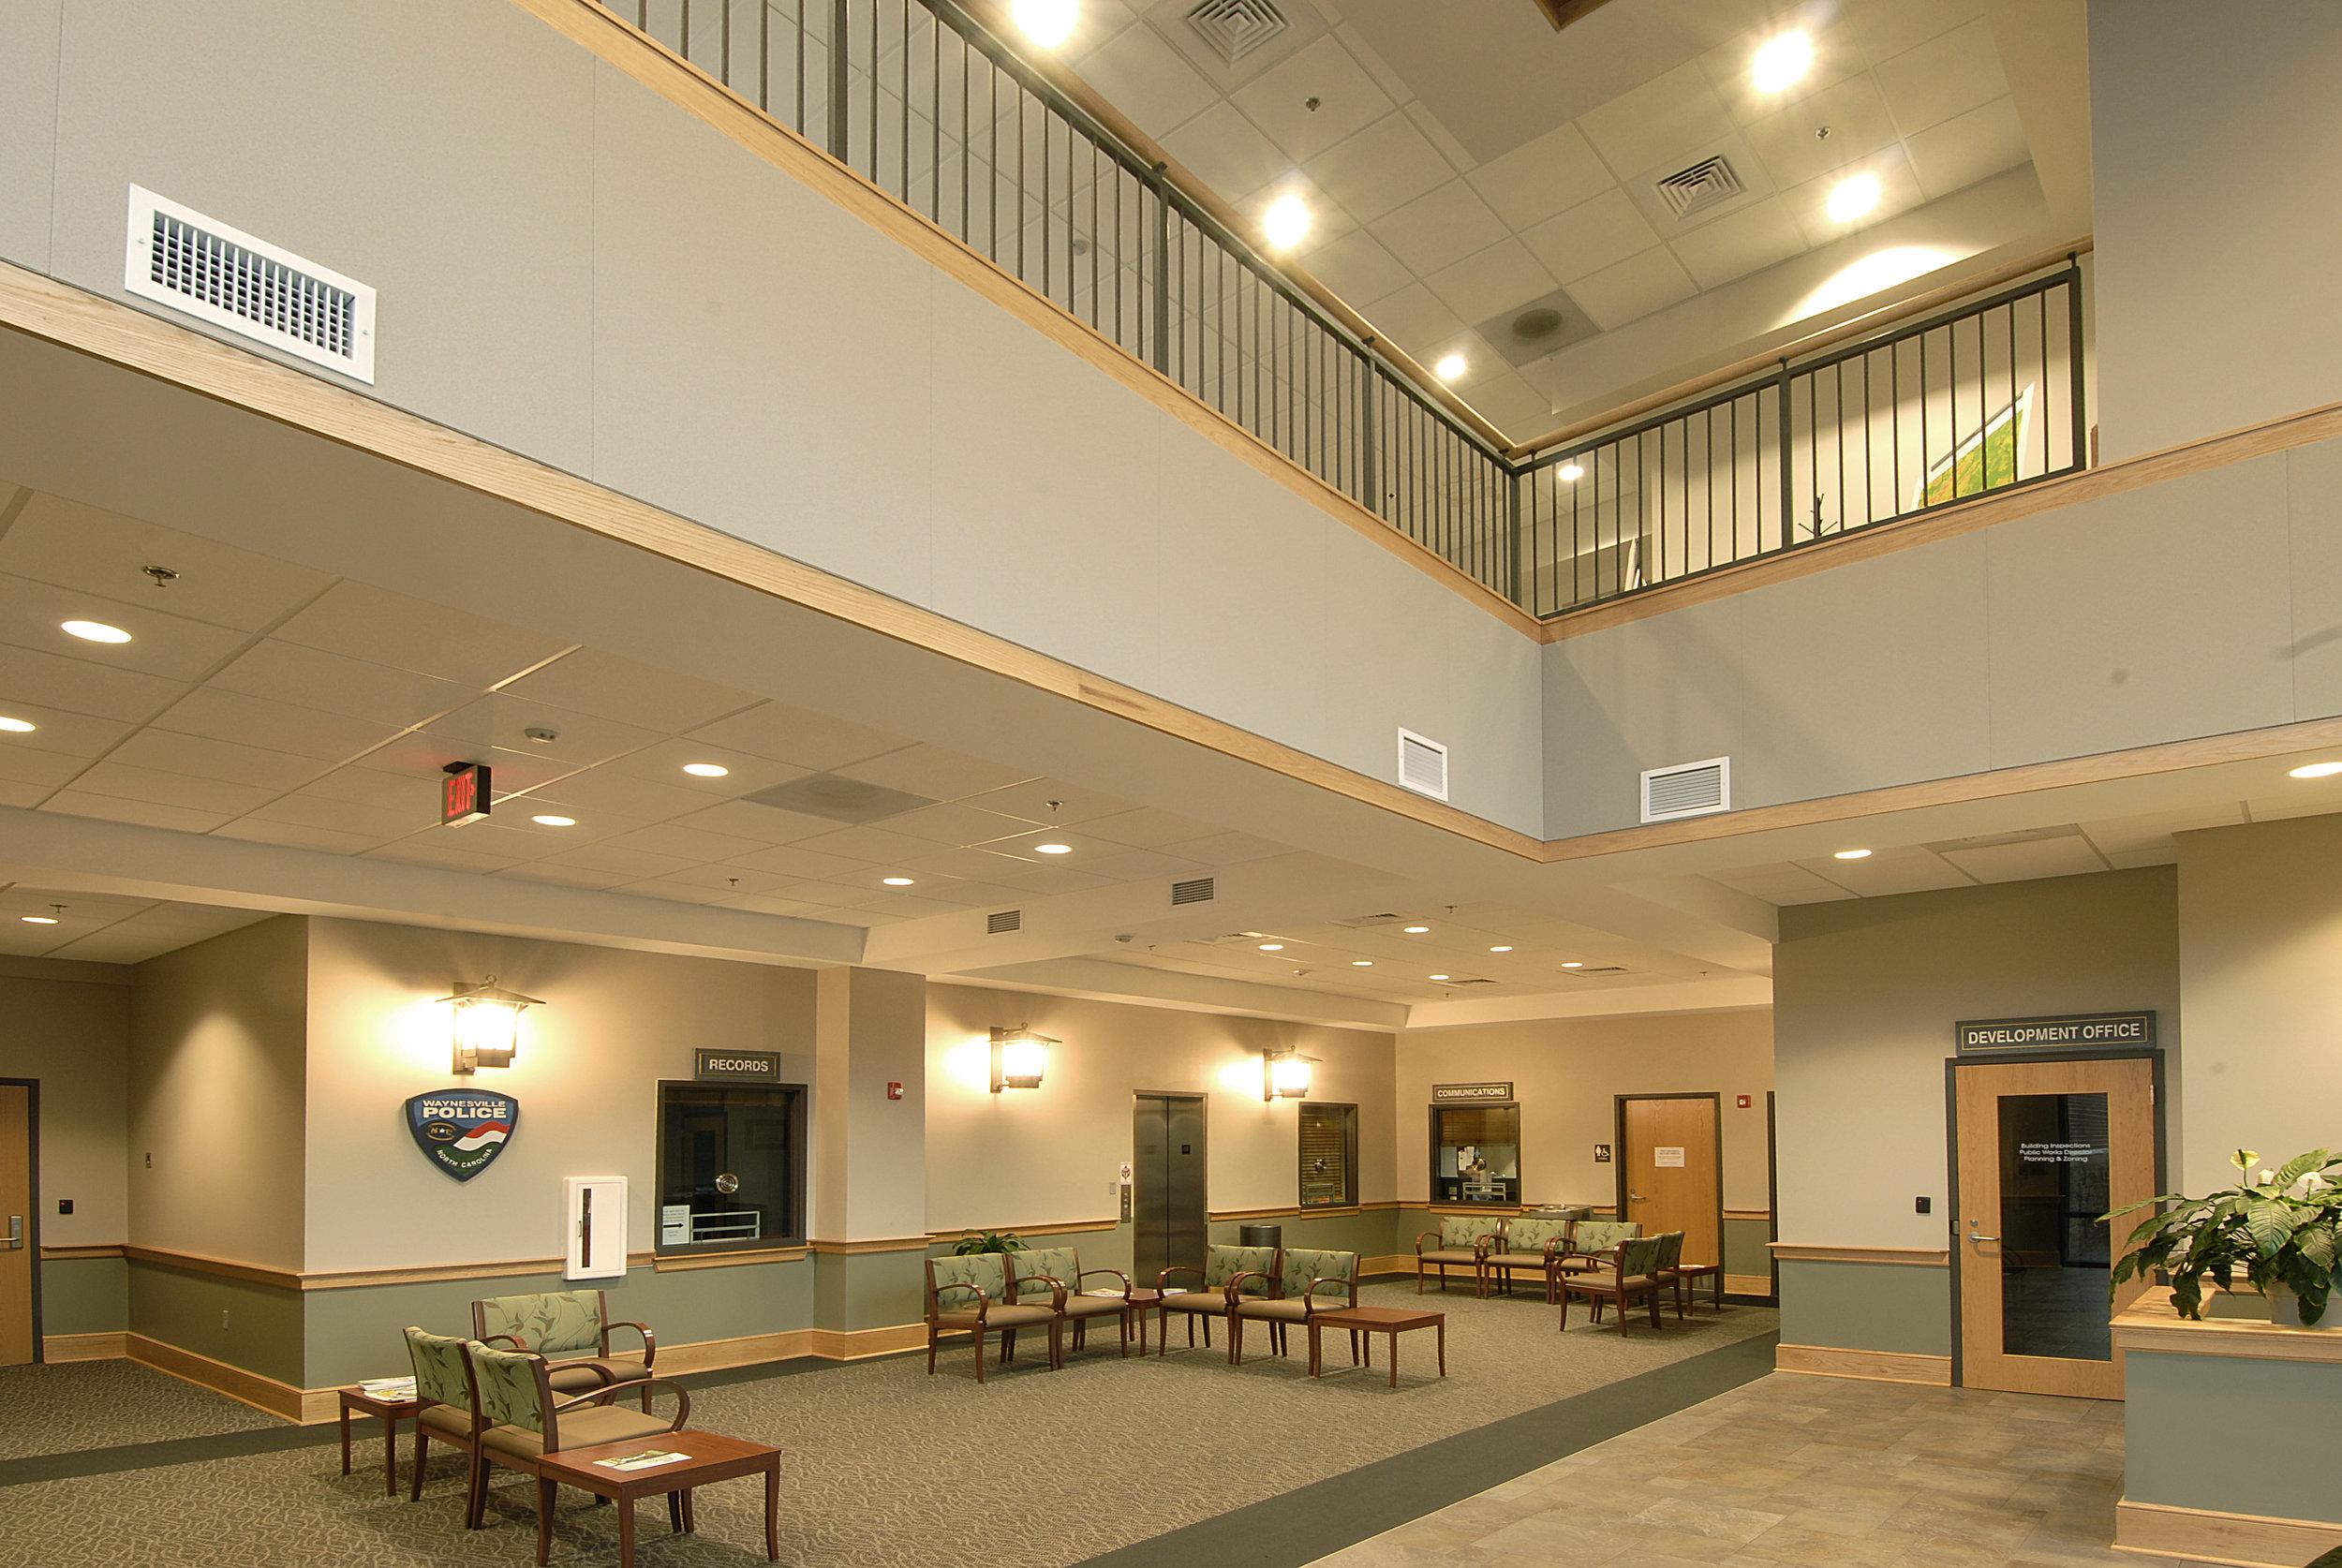 ADW-Civic-Town-Hall-Police-Waynesville-NC-Lobby.jpg